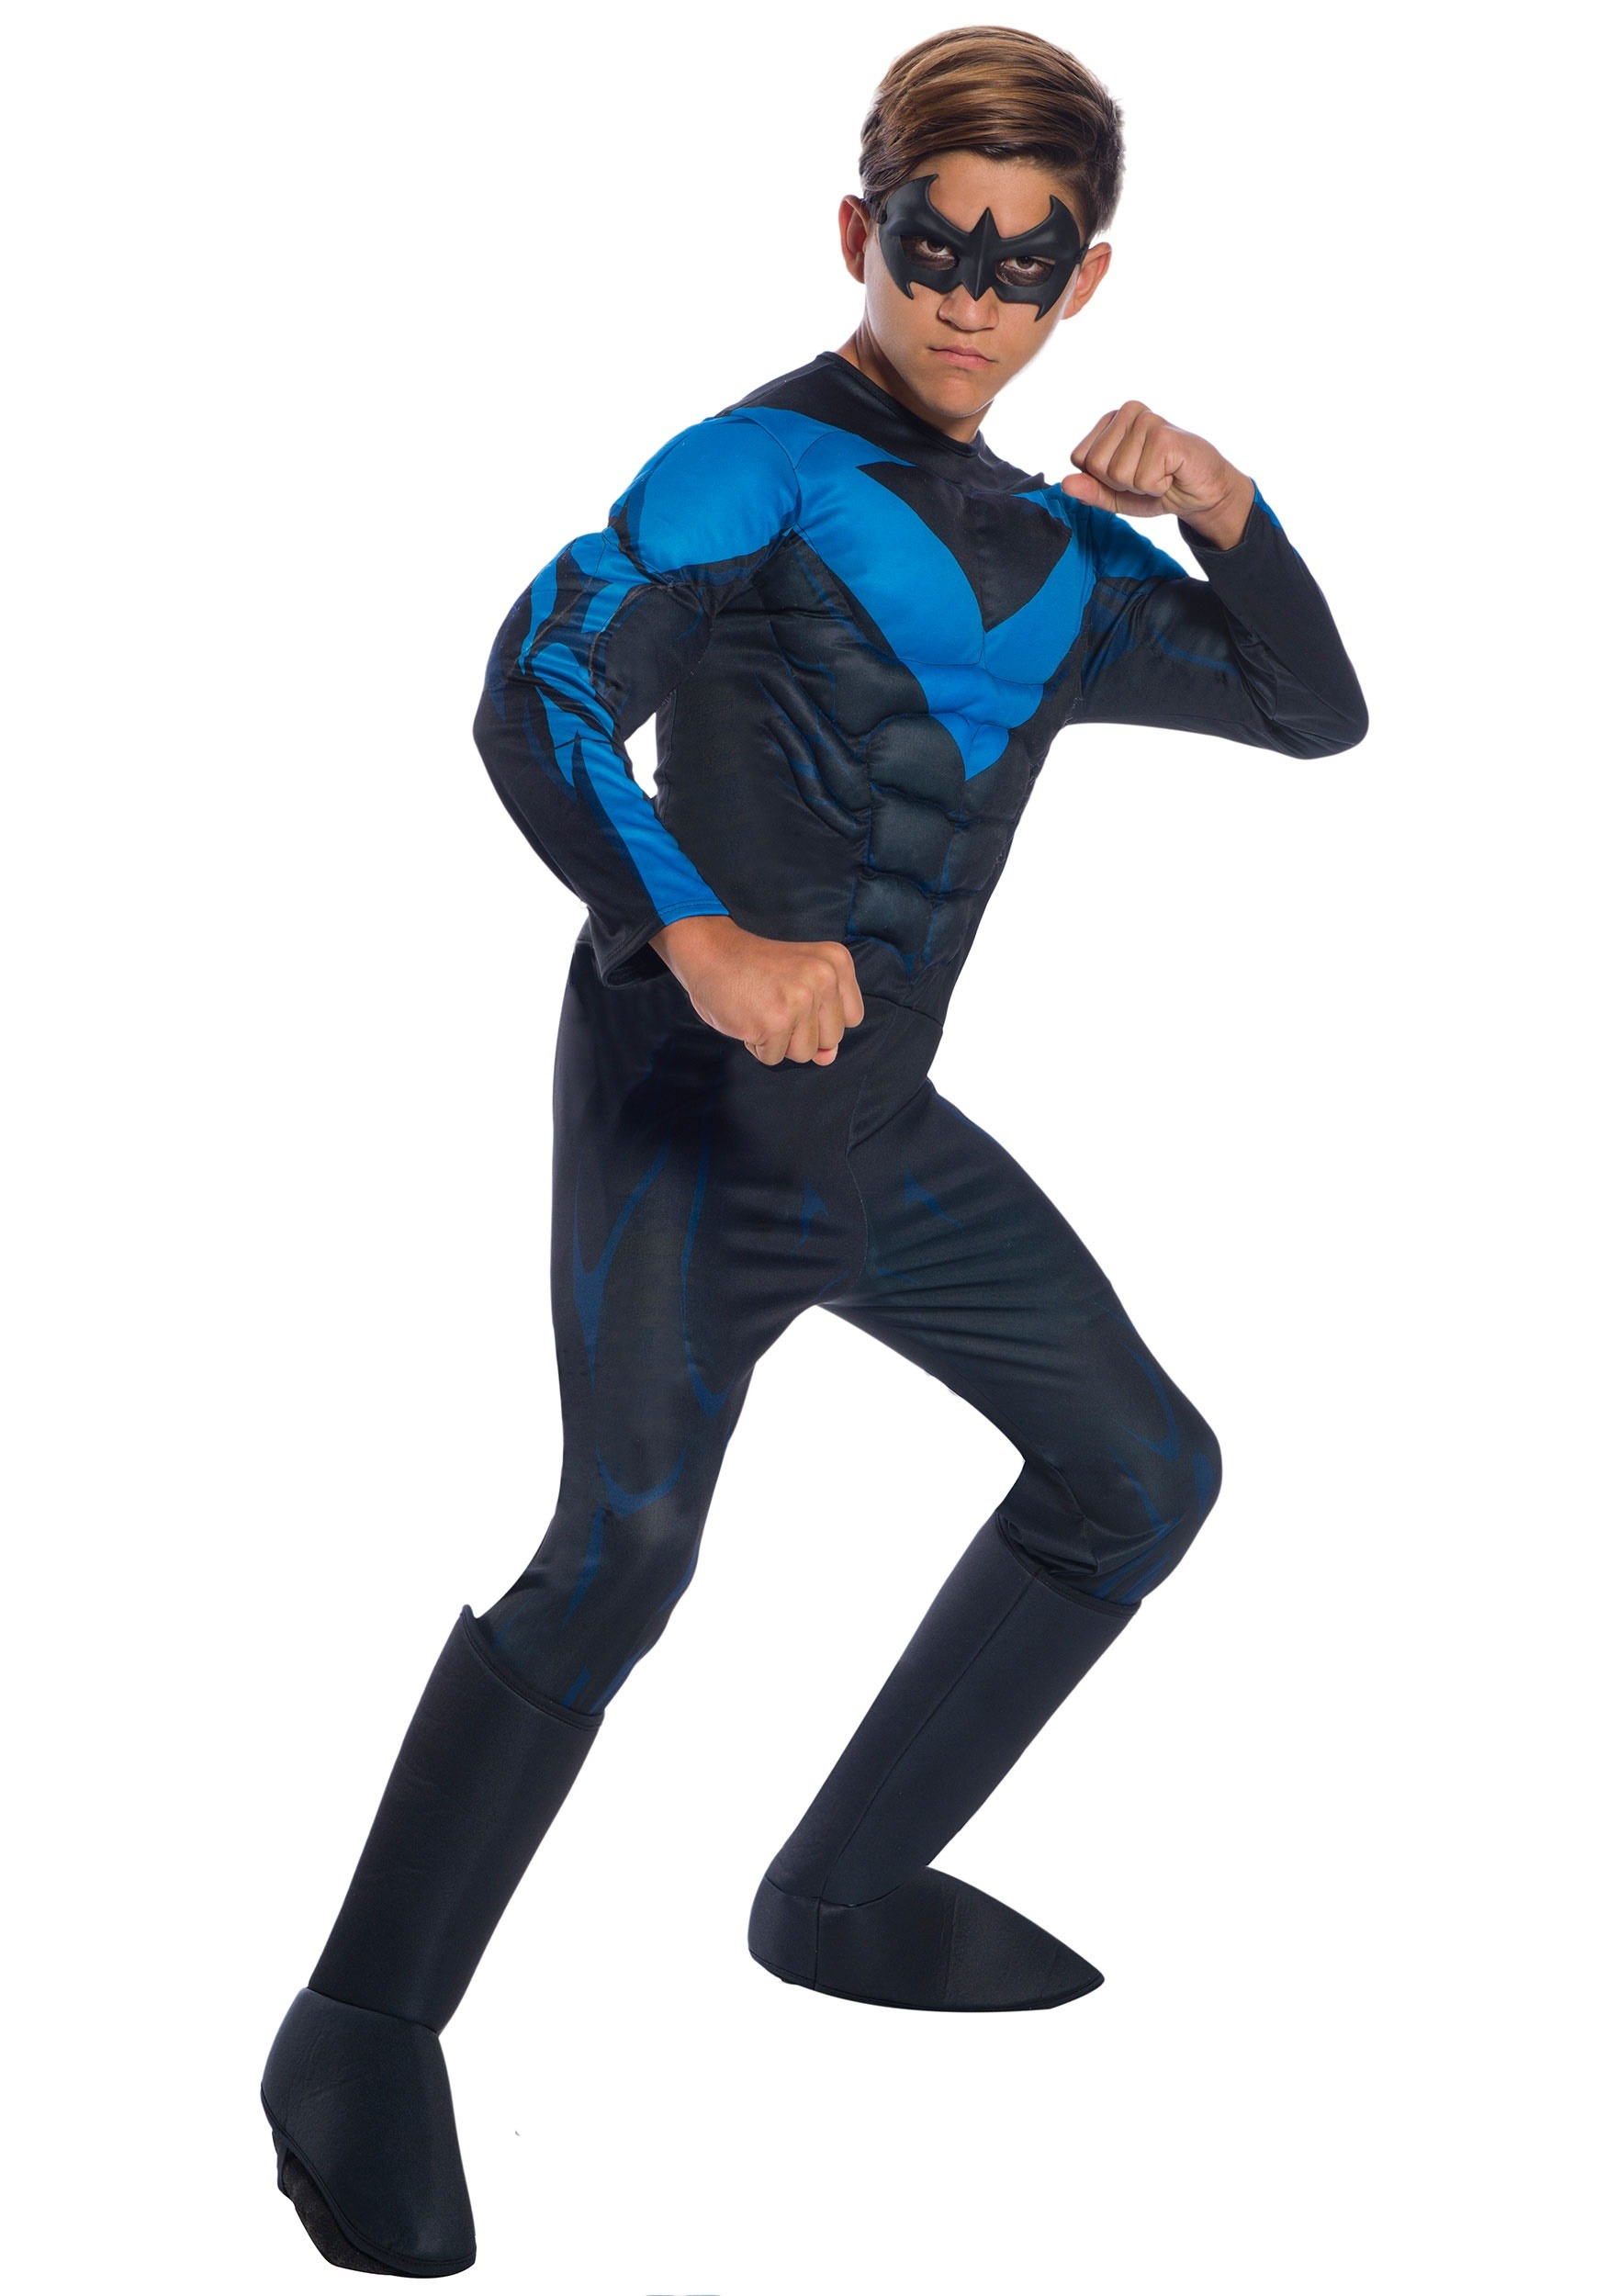 Nightwing Costume For Kids Child Nightwing Costum...